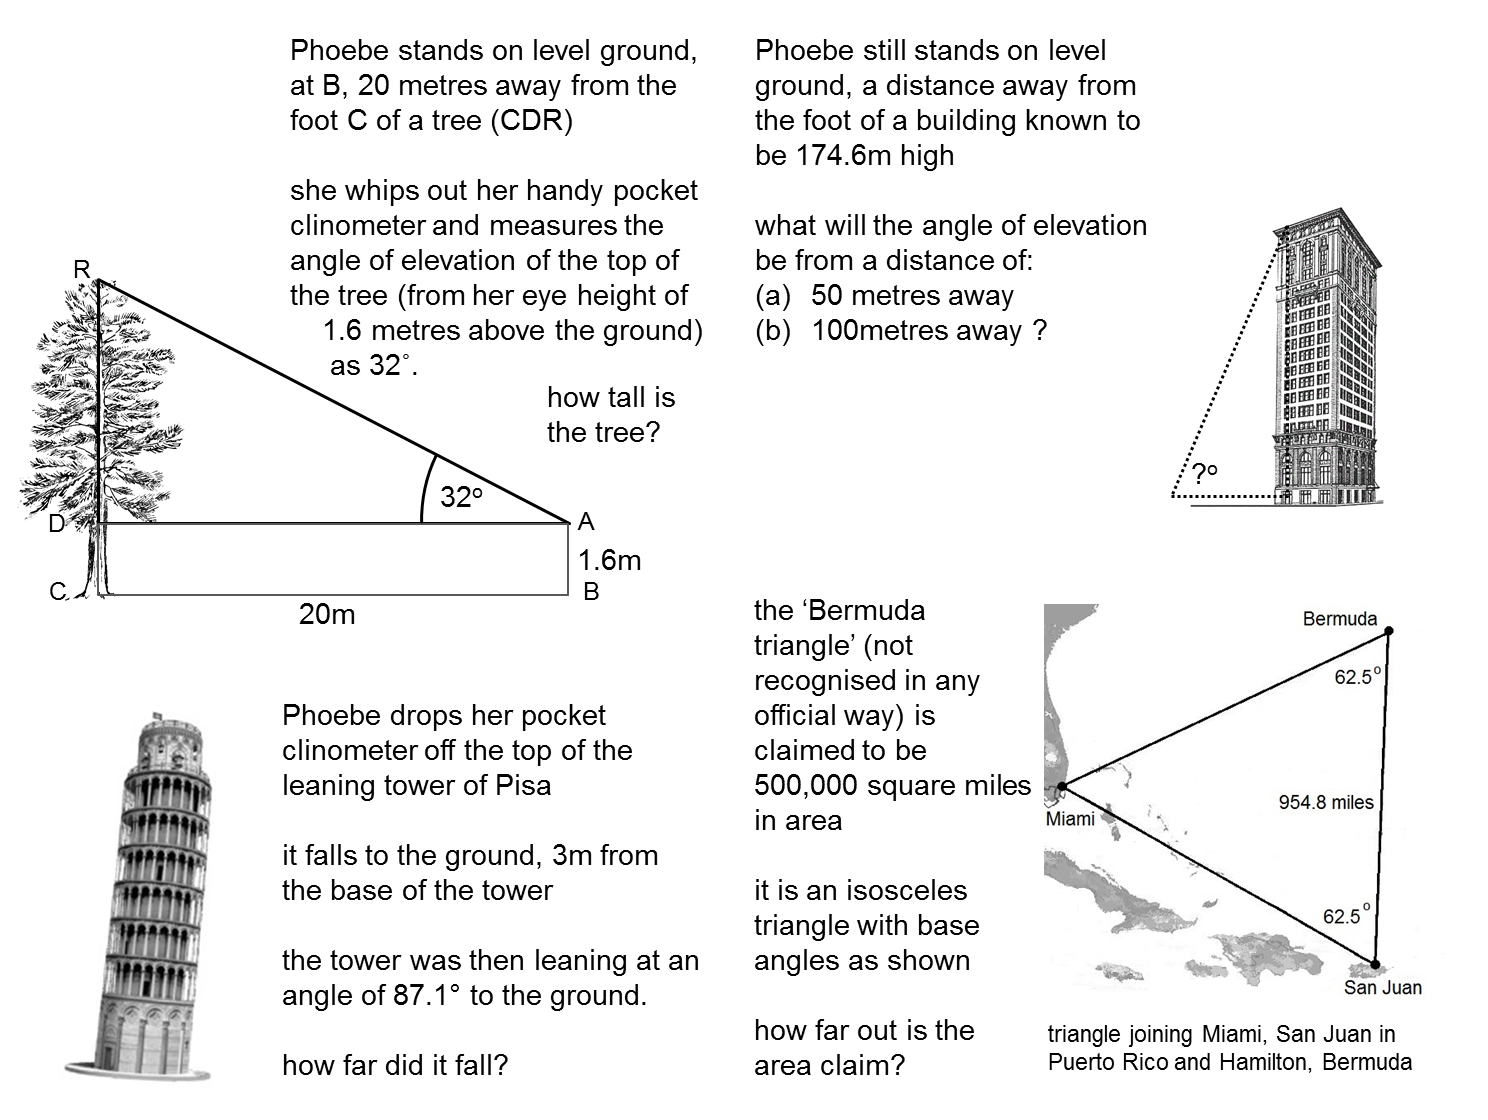 math worksheet : trigonometric ratio word problems worksheets  trigonometric ratio  : Ratio Math Problems Worksheets